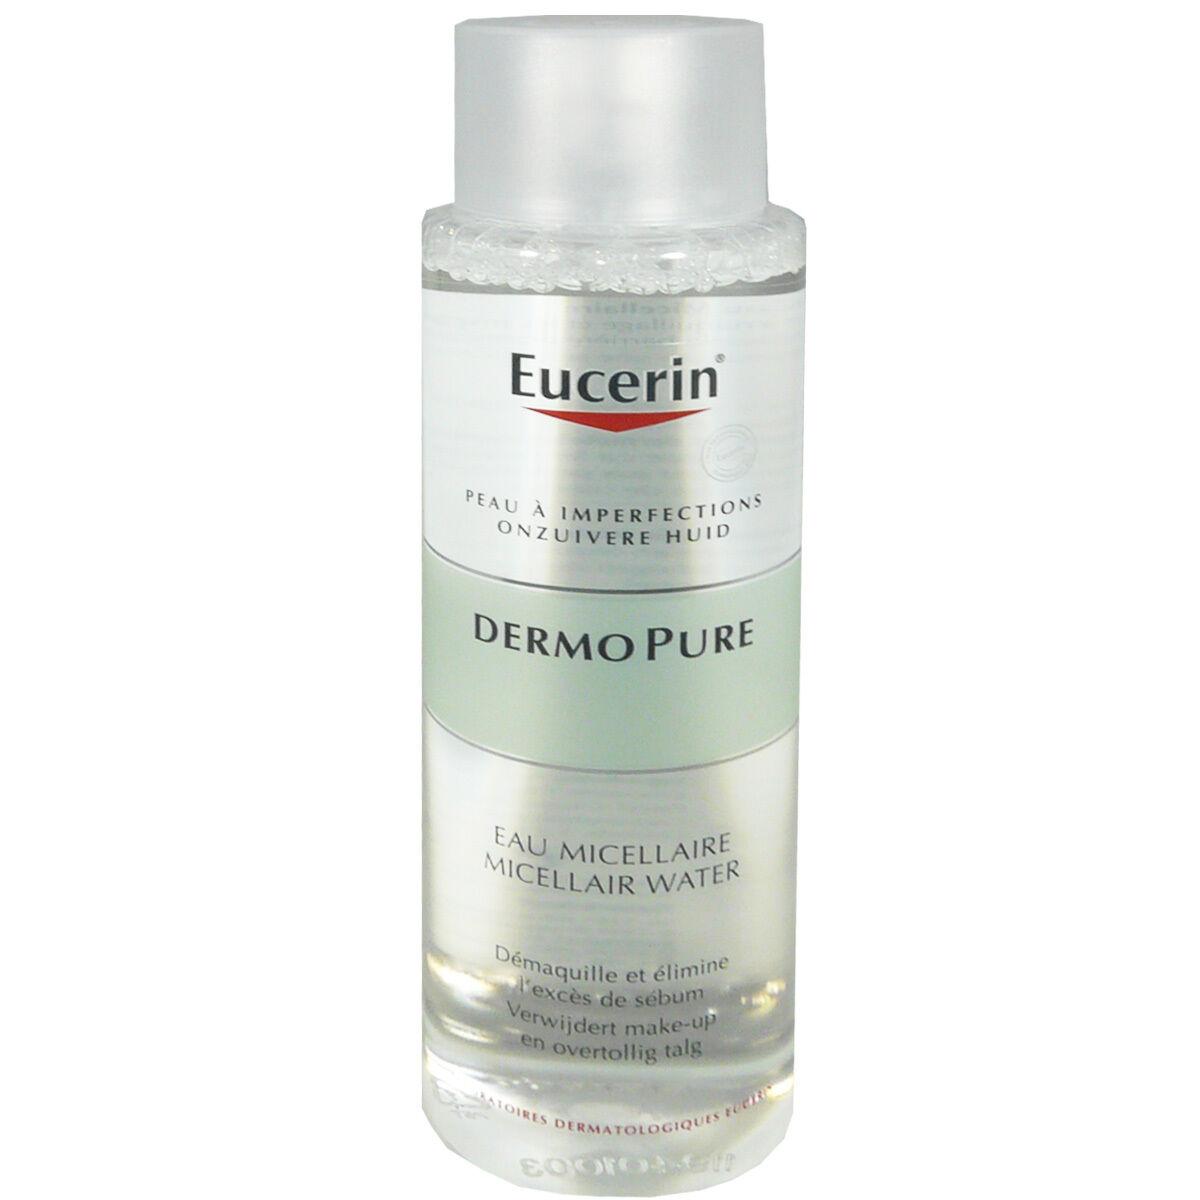 Eucerin dermopure eau micellaire 400 ml peau a imperfections